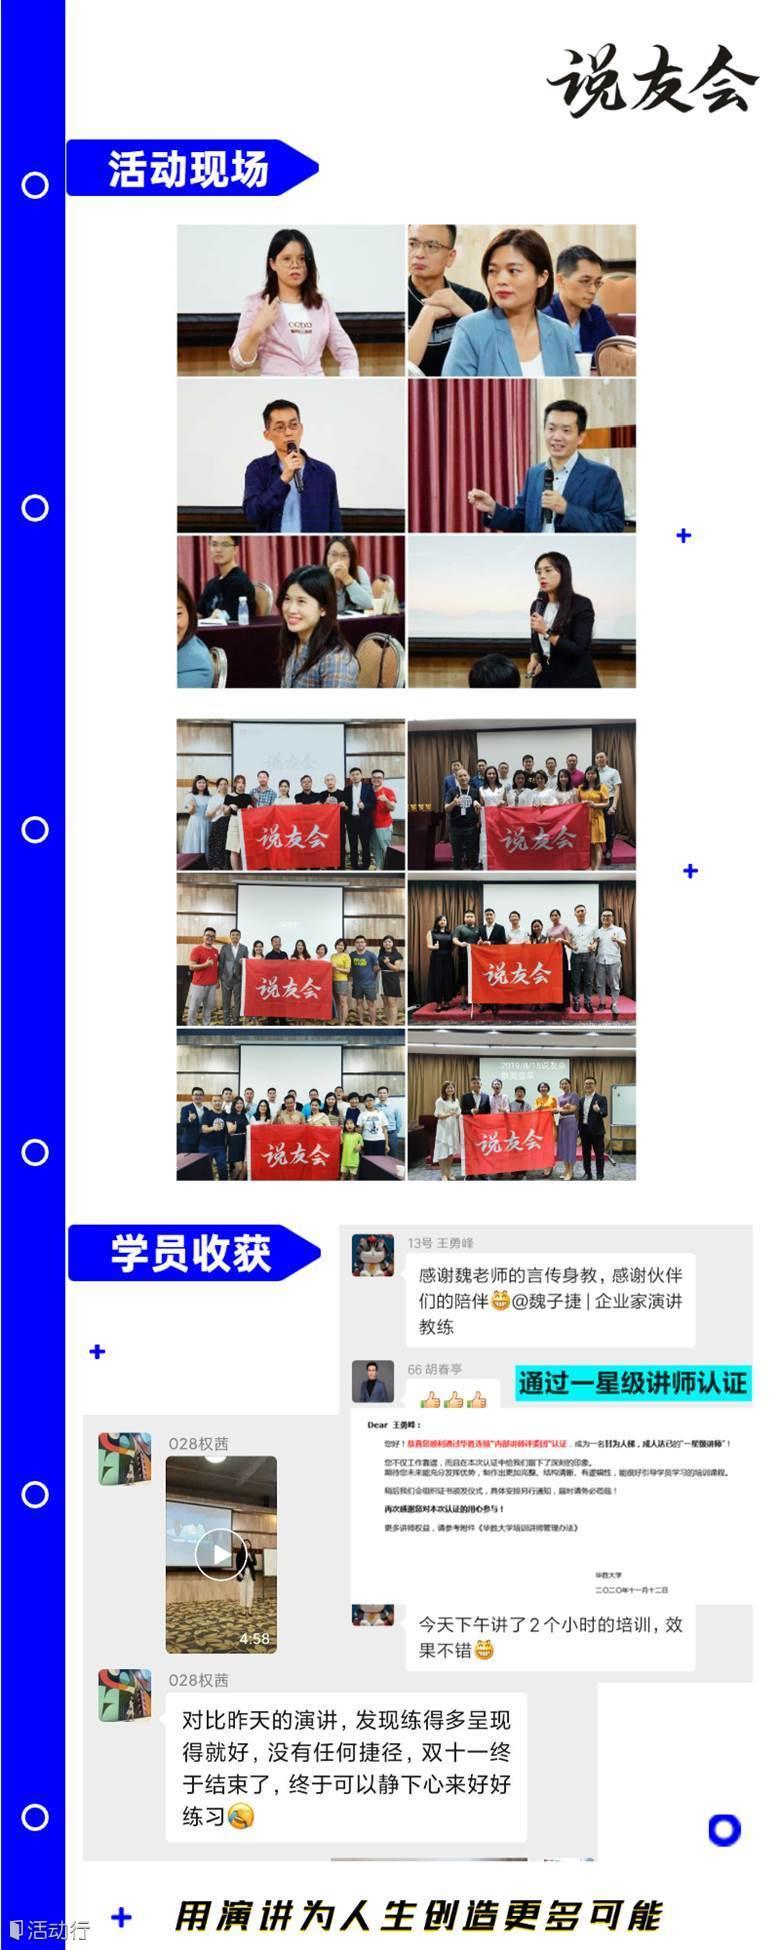 http://www.huodongxing.com/file/20201030/3043955848055/154139488239526.png